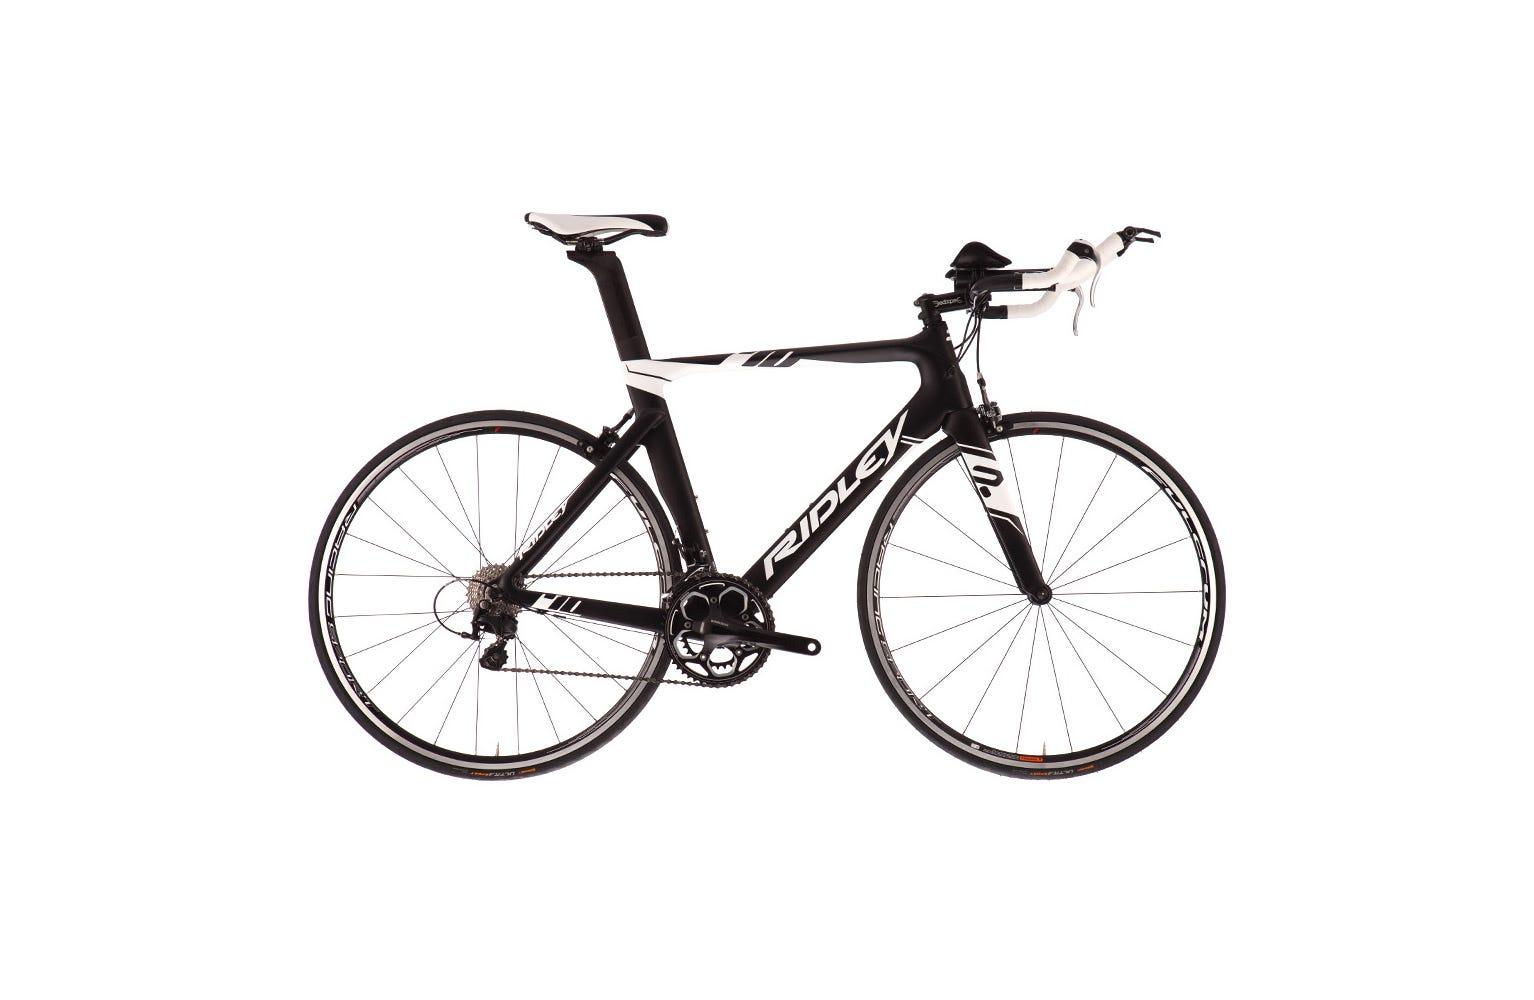 Ridley Chronus D- Black/White - MD bike w/105 Mix Ex Display